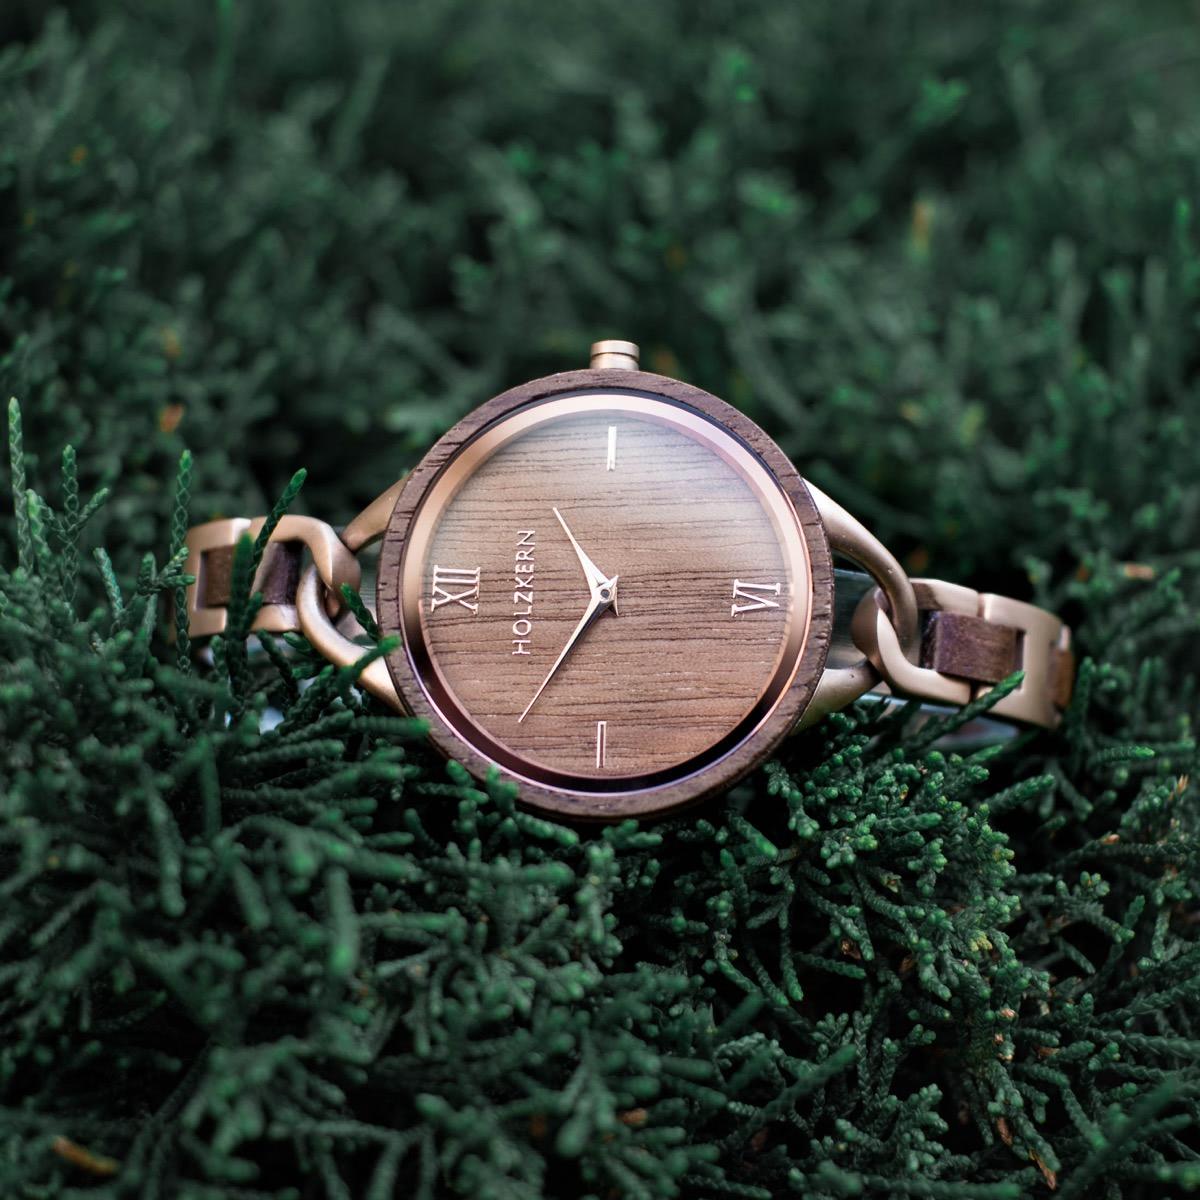 Women's wood watch Silk Fiber on the greenery